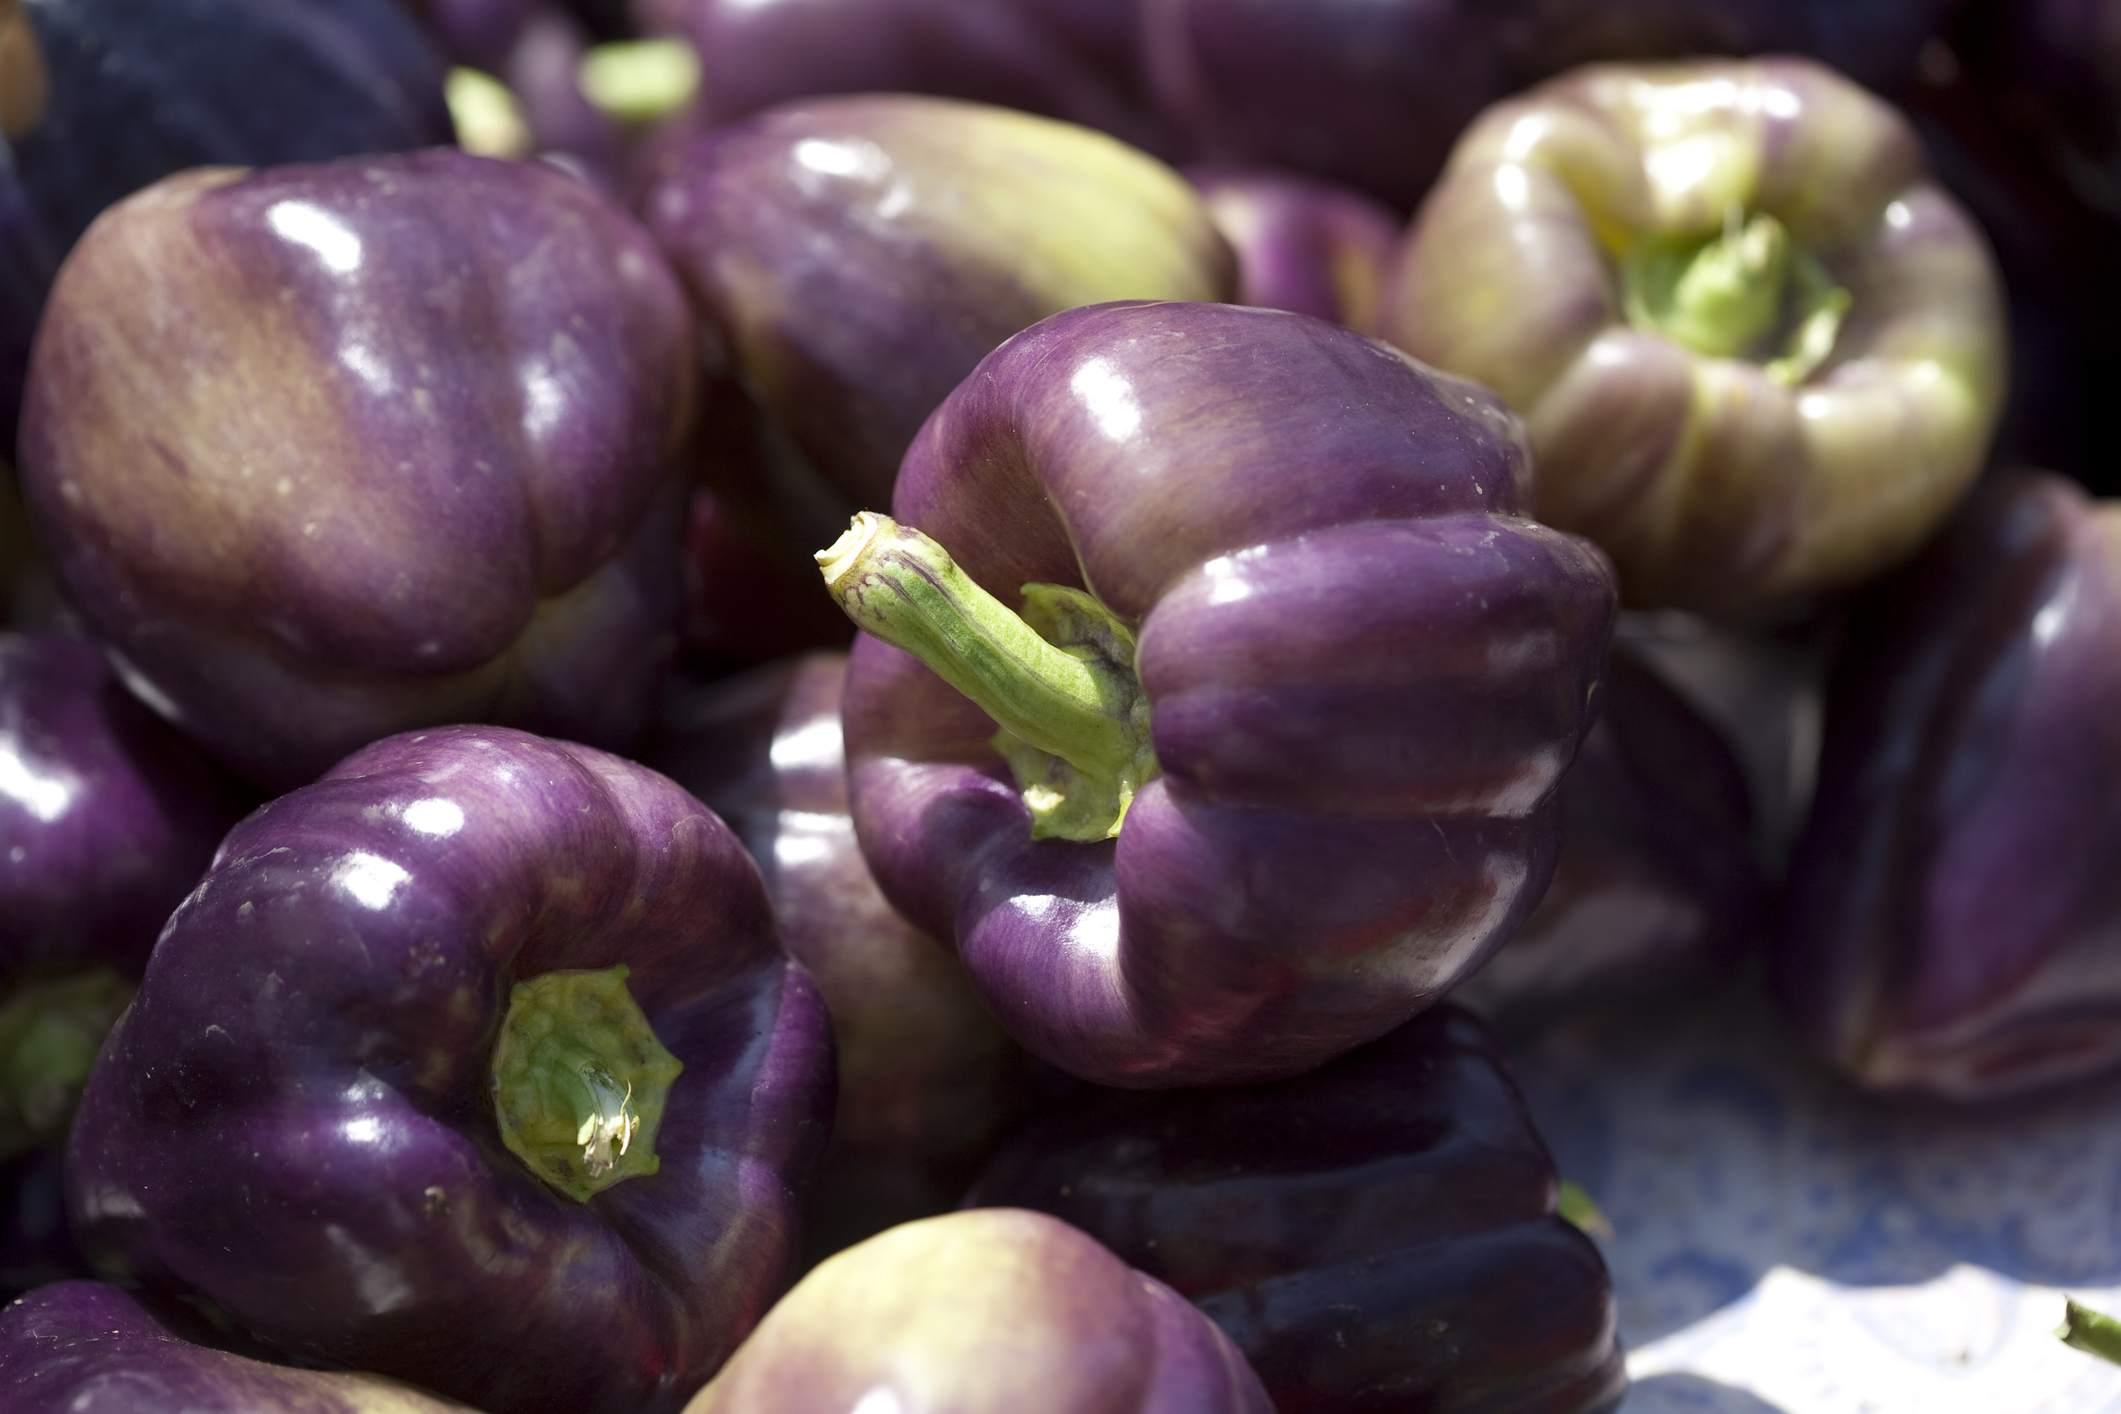 Sweet Bell Peppers—Purple